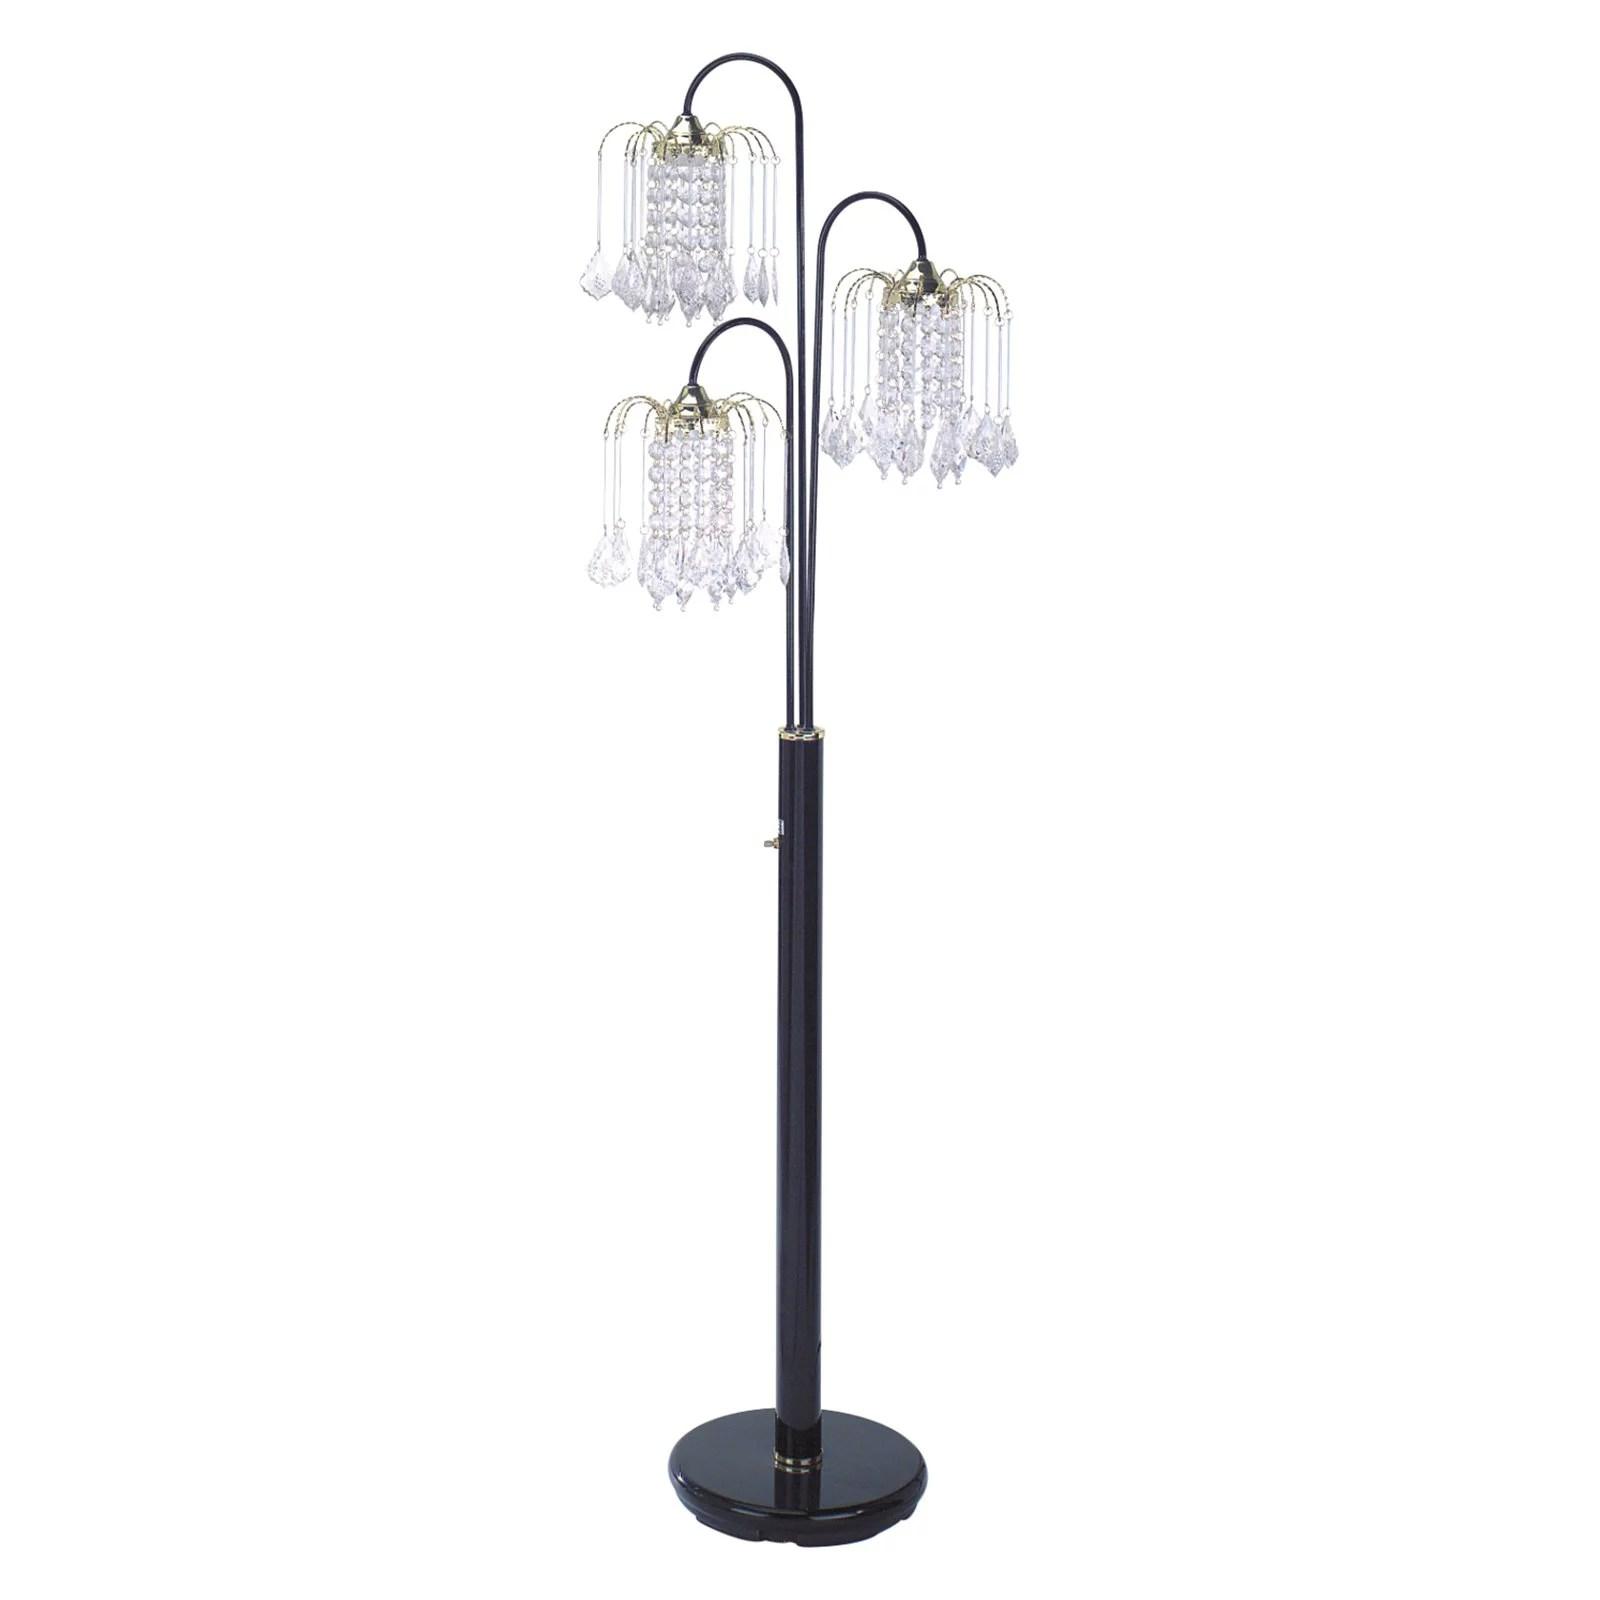 Milton Greens Sullivan 3 Way Floor Lamp